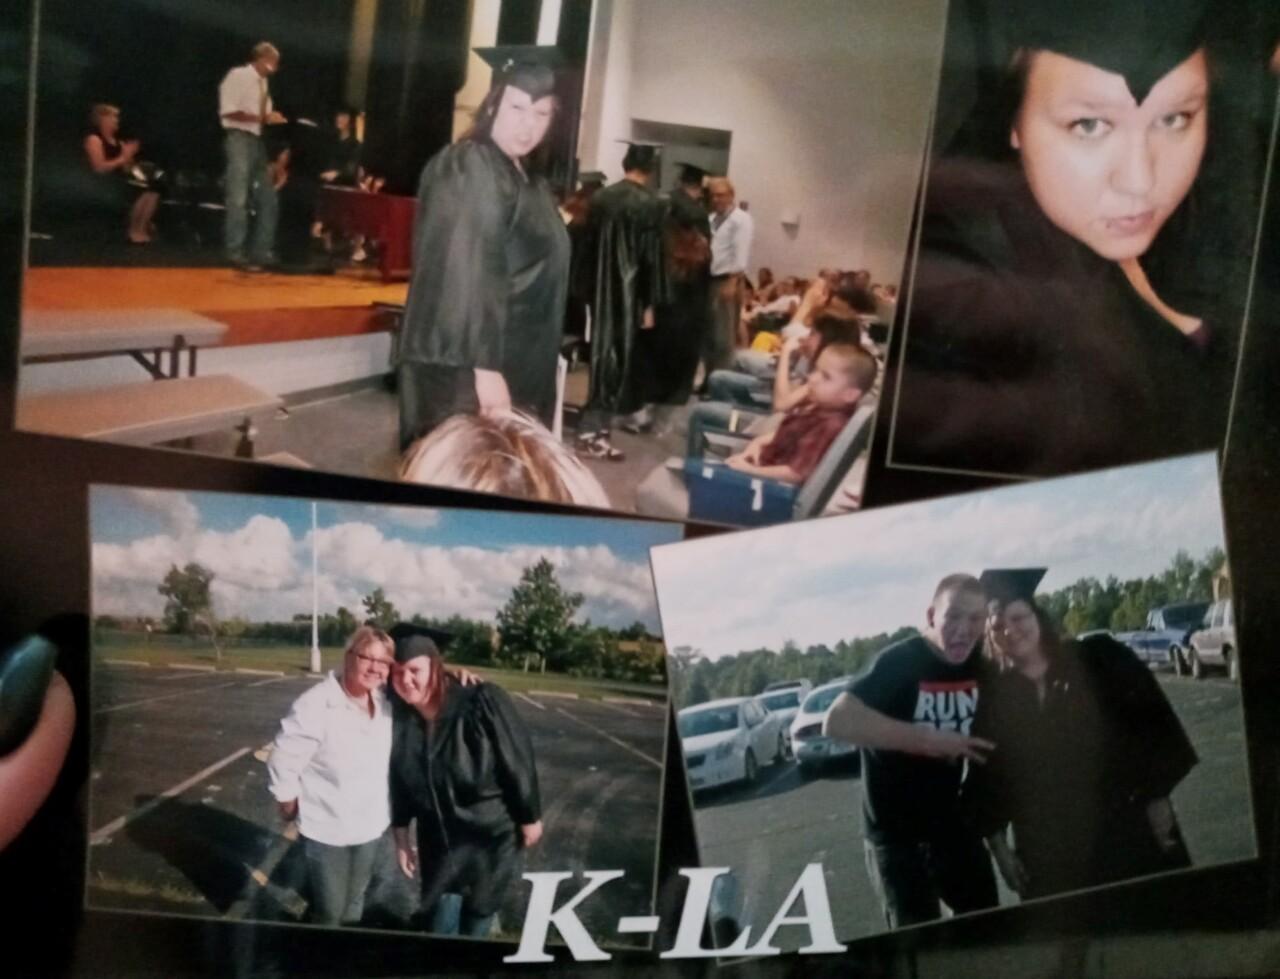 Kayla_McClain_HS_pics.jpg